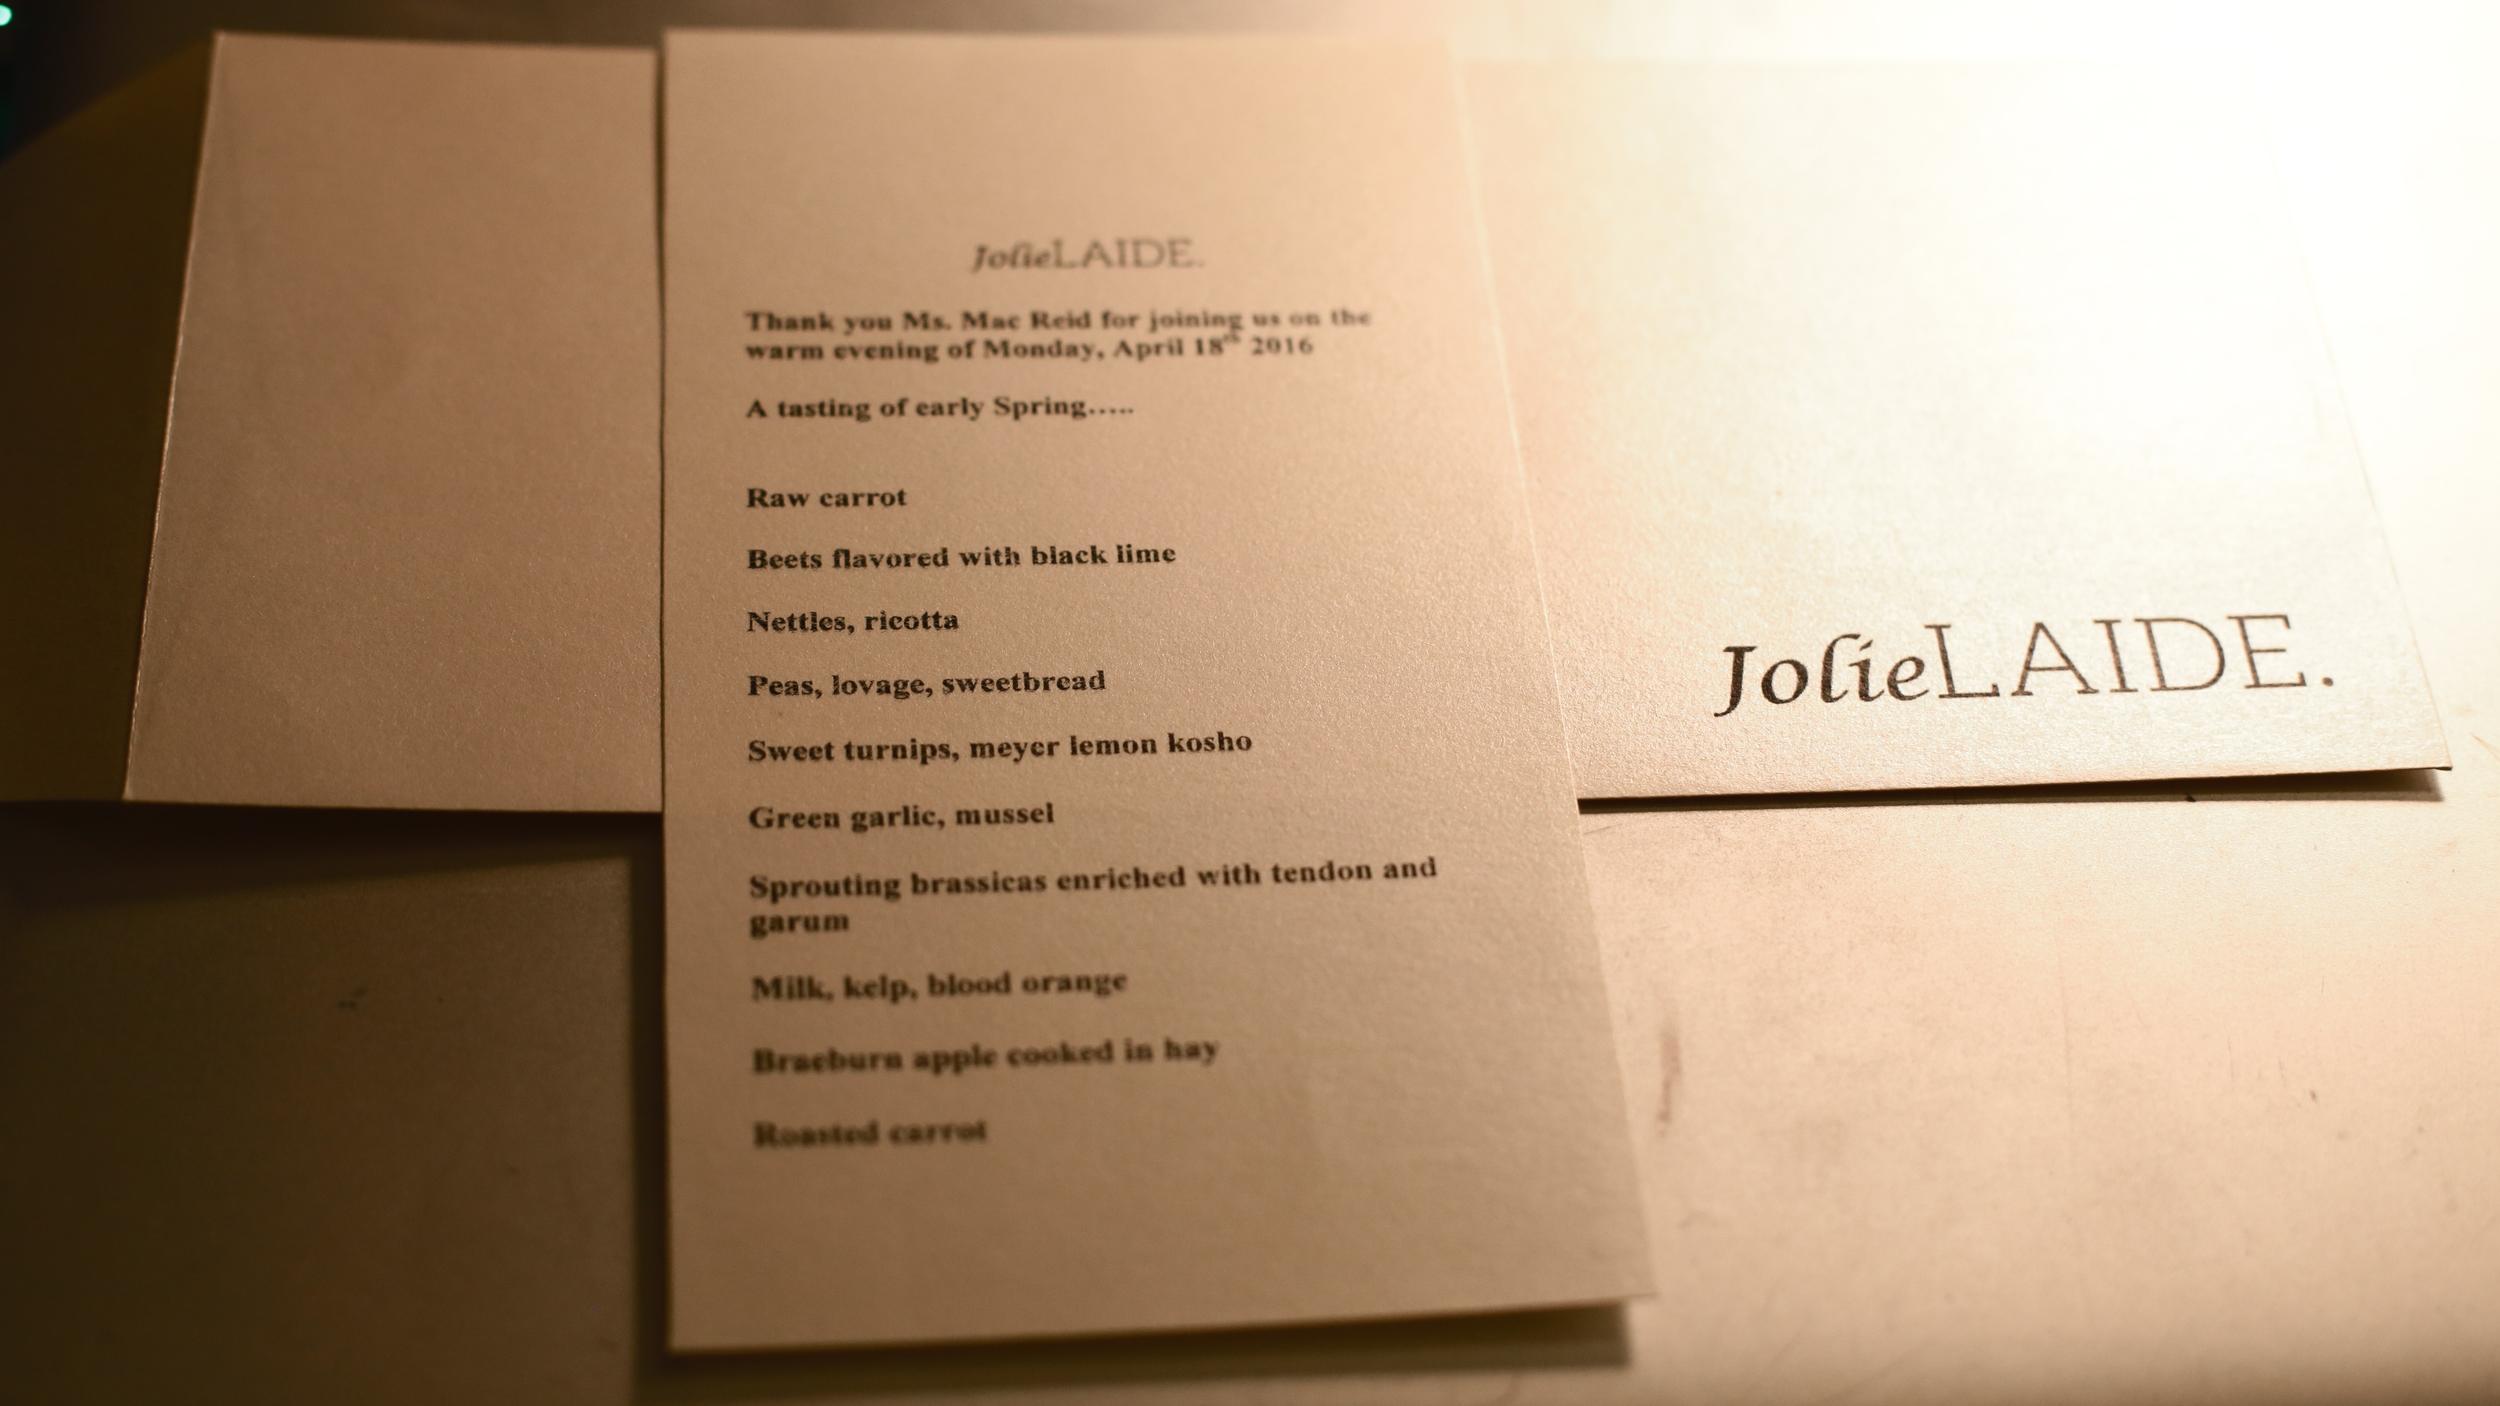 Our evening's tasting menu.